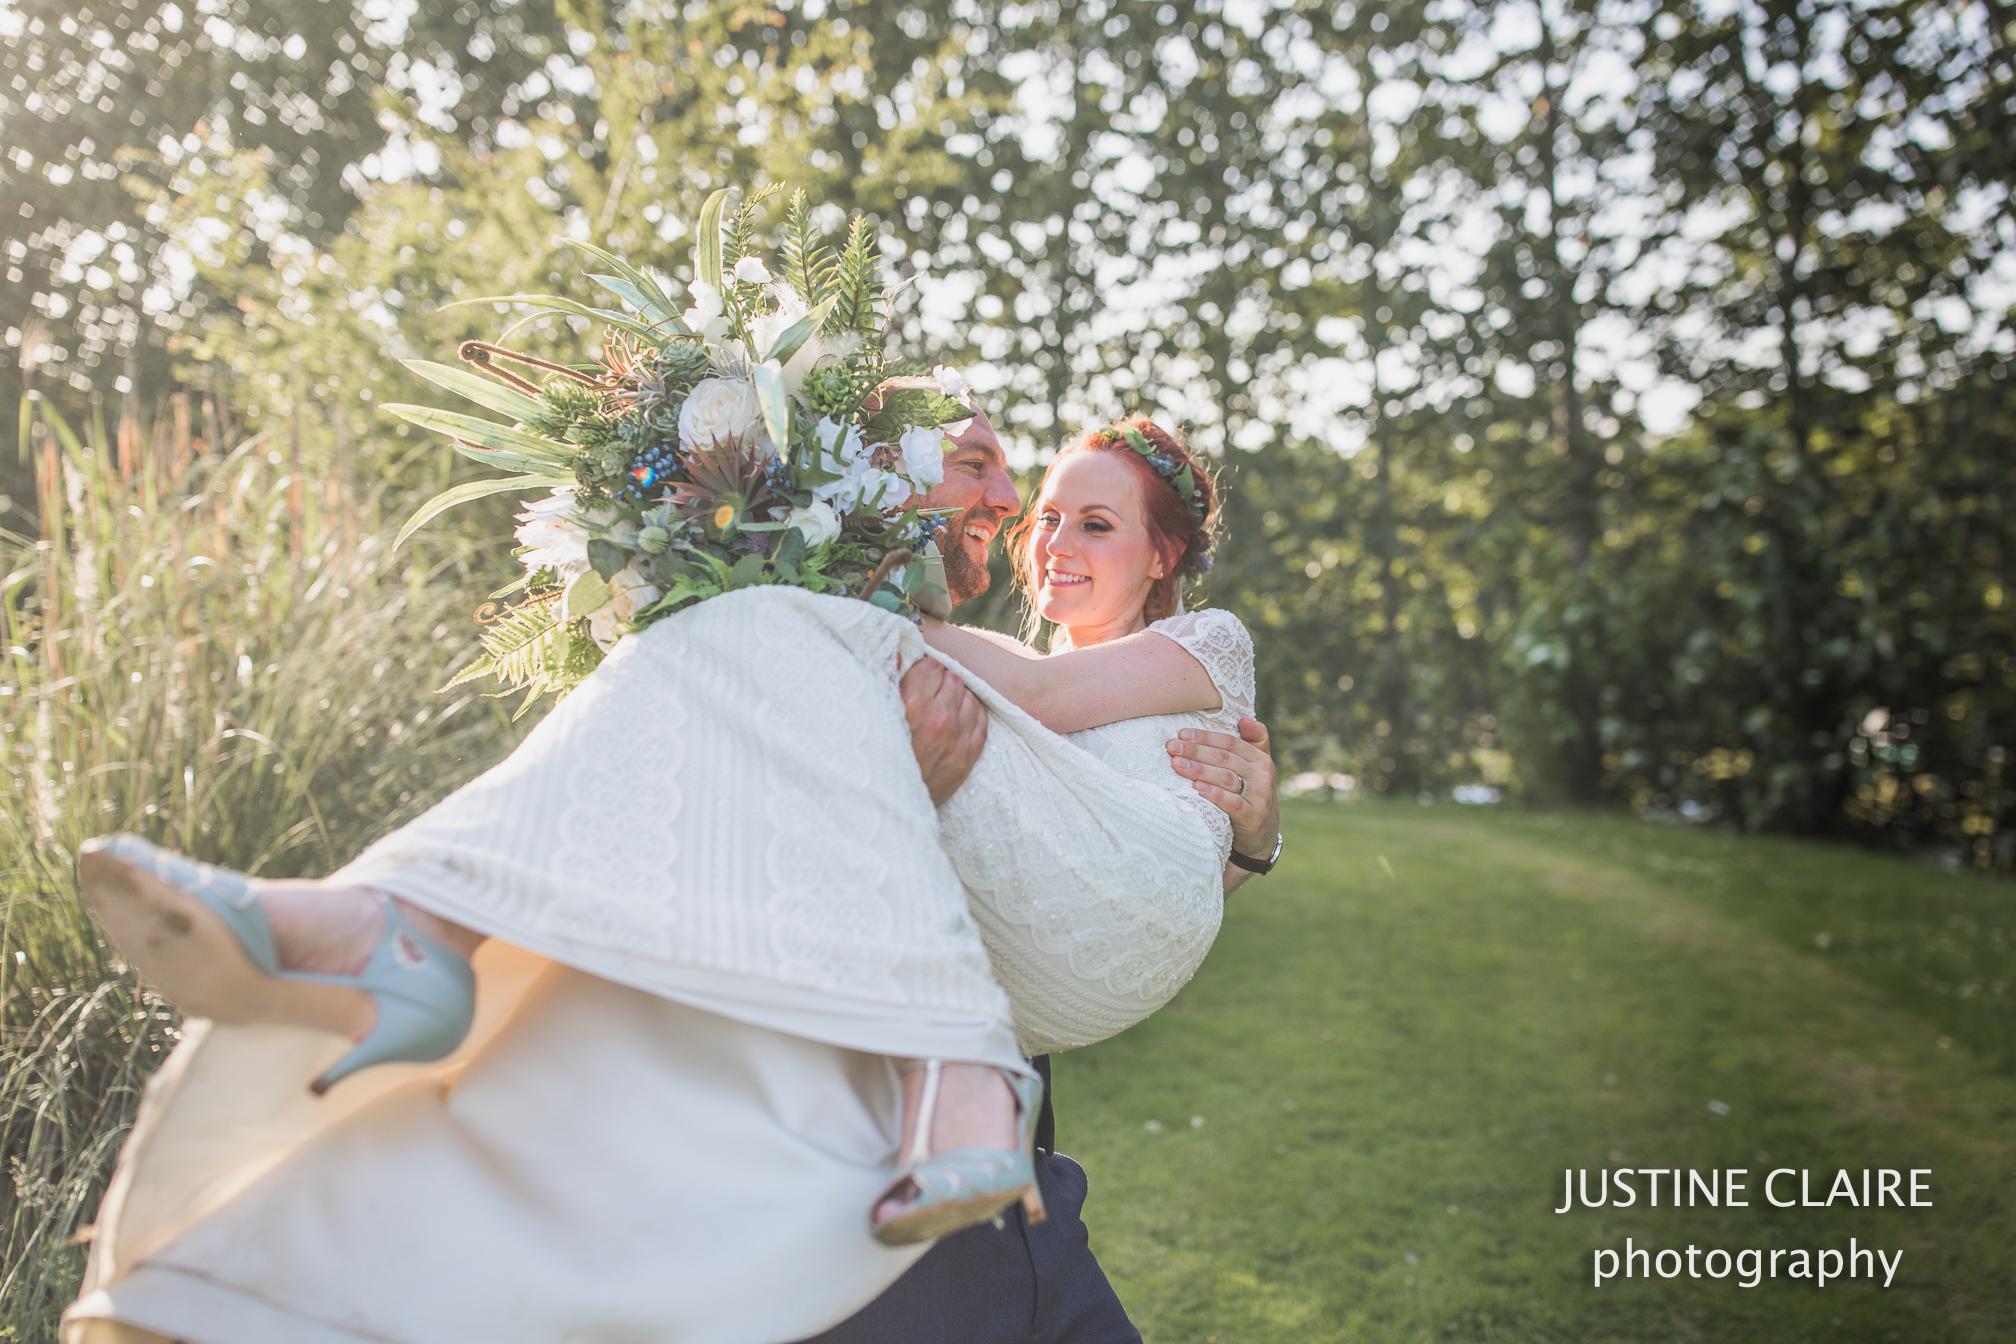 Rumbolds farm wedding photographers plaistow Billingshurst-6-2.jpg